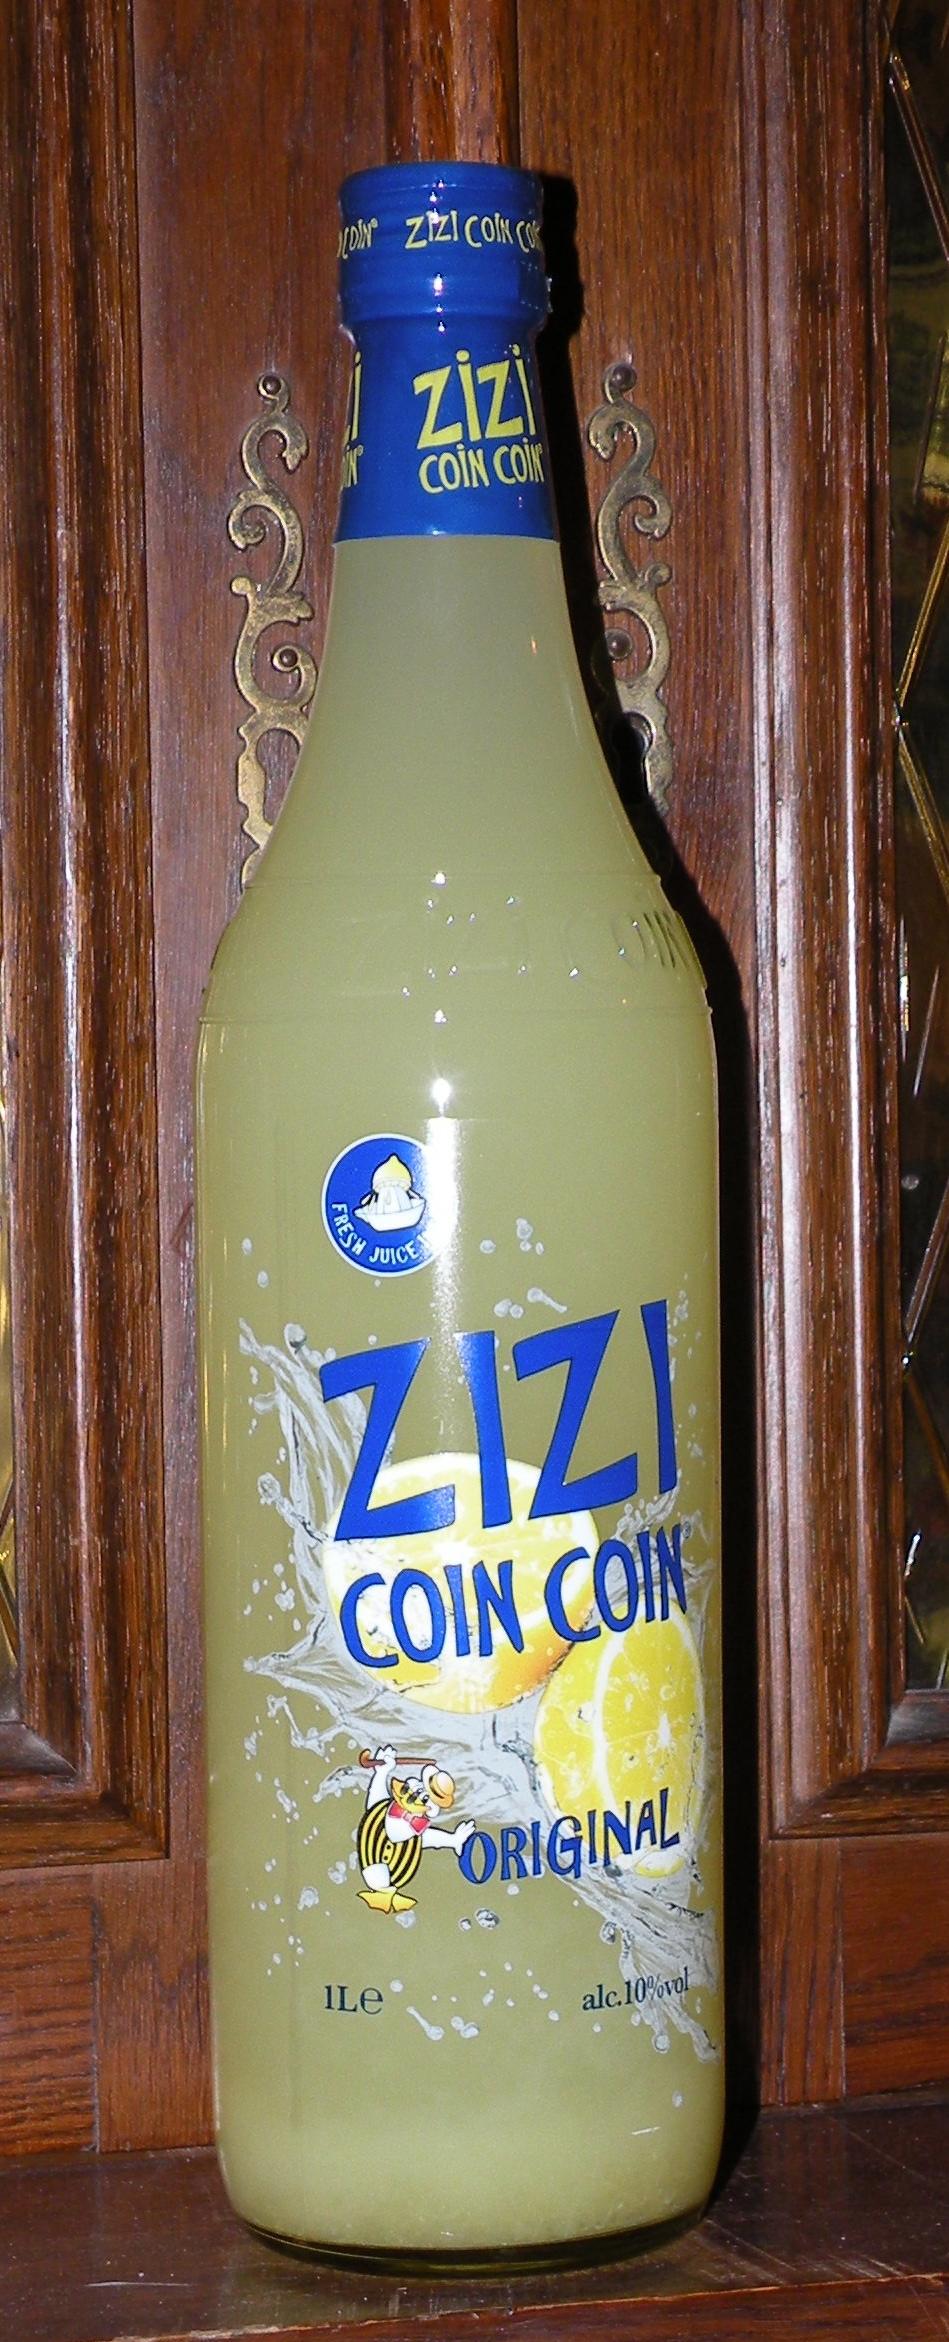 Zizi coin coin wikip dia for Cognac auchan